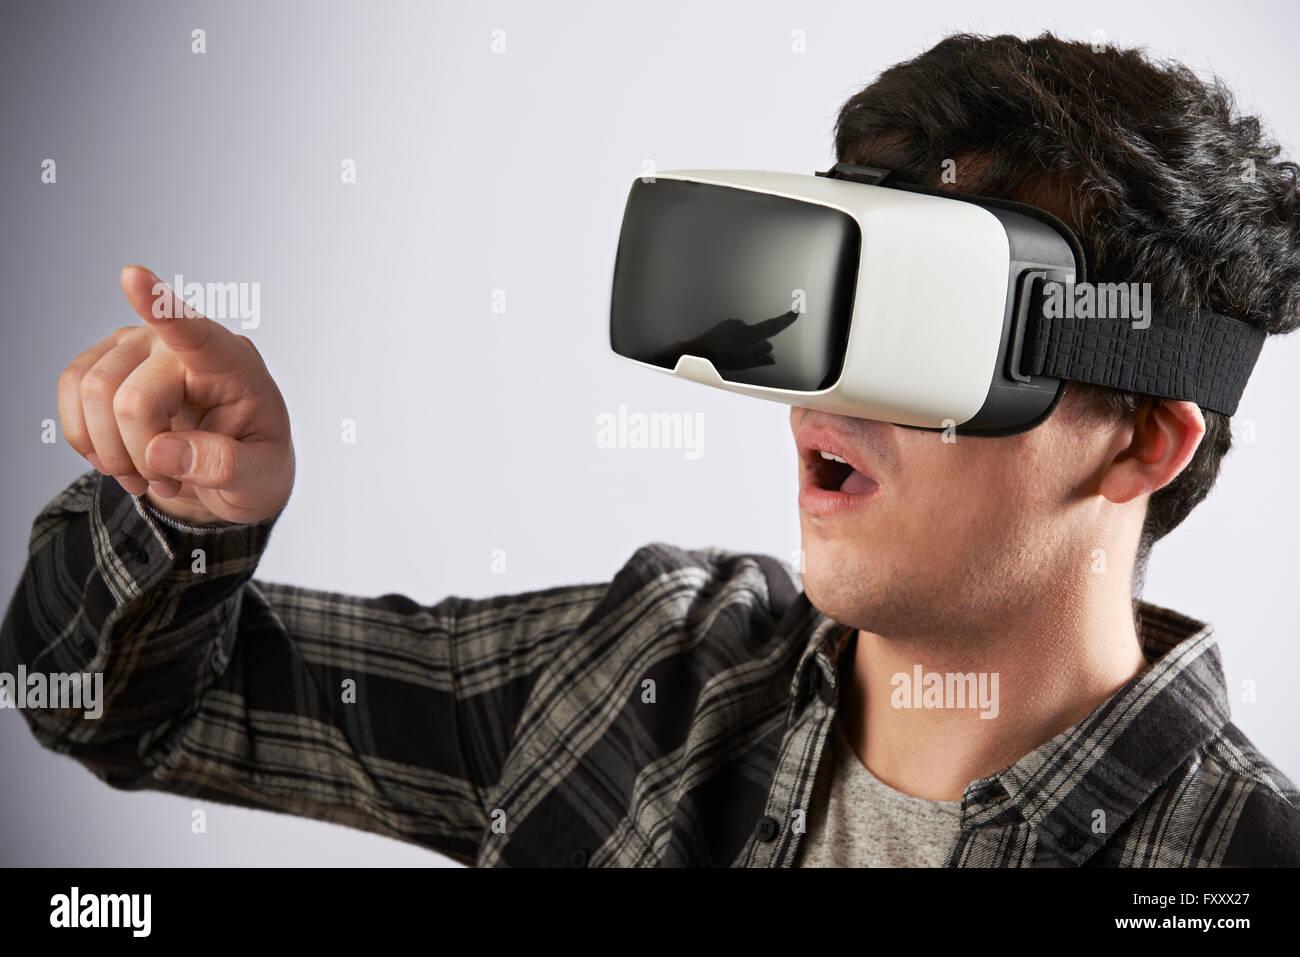 Young Man Wearing Virtual Reality Headset - Stock Image